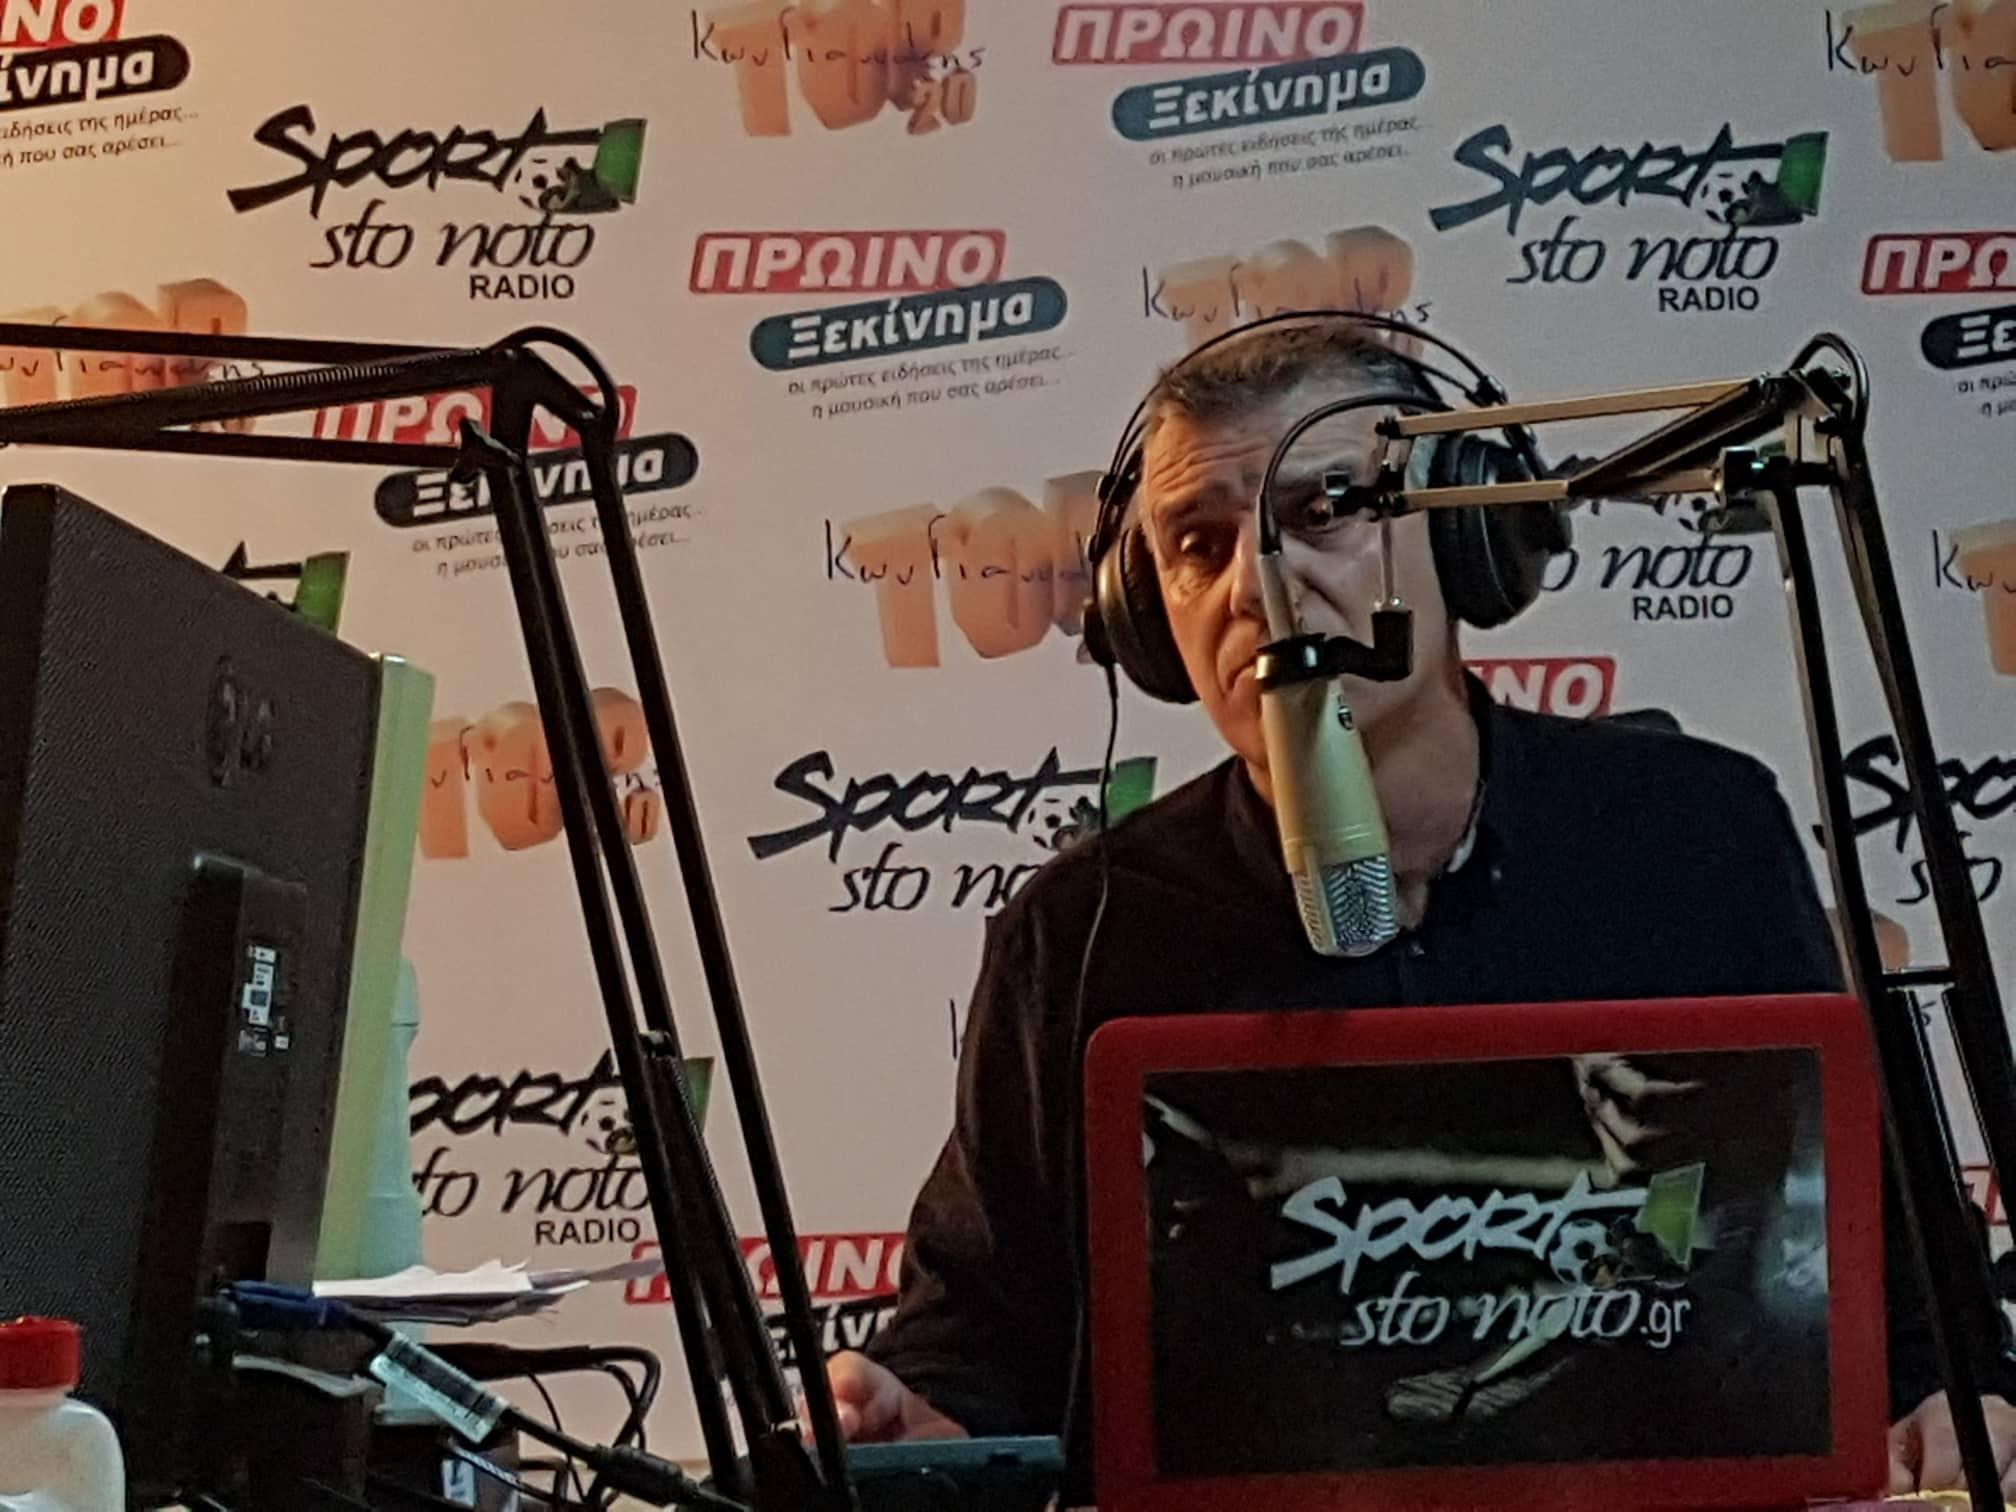 """Sportstonoto Radio"" ξανά σήμερα μαζί σας! (5-8 μ.μ.)"